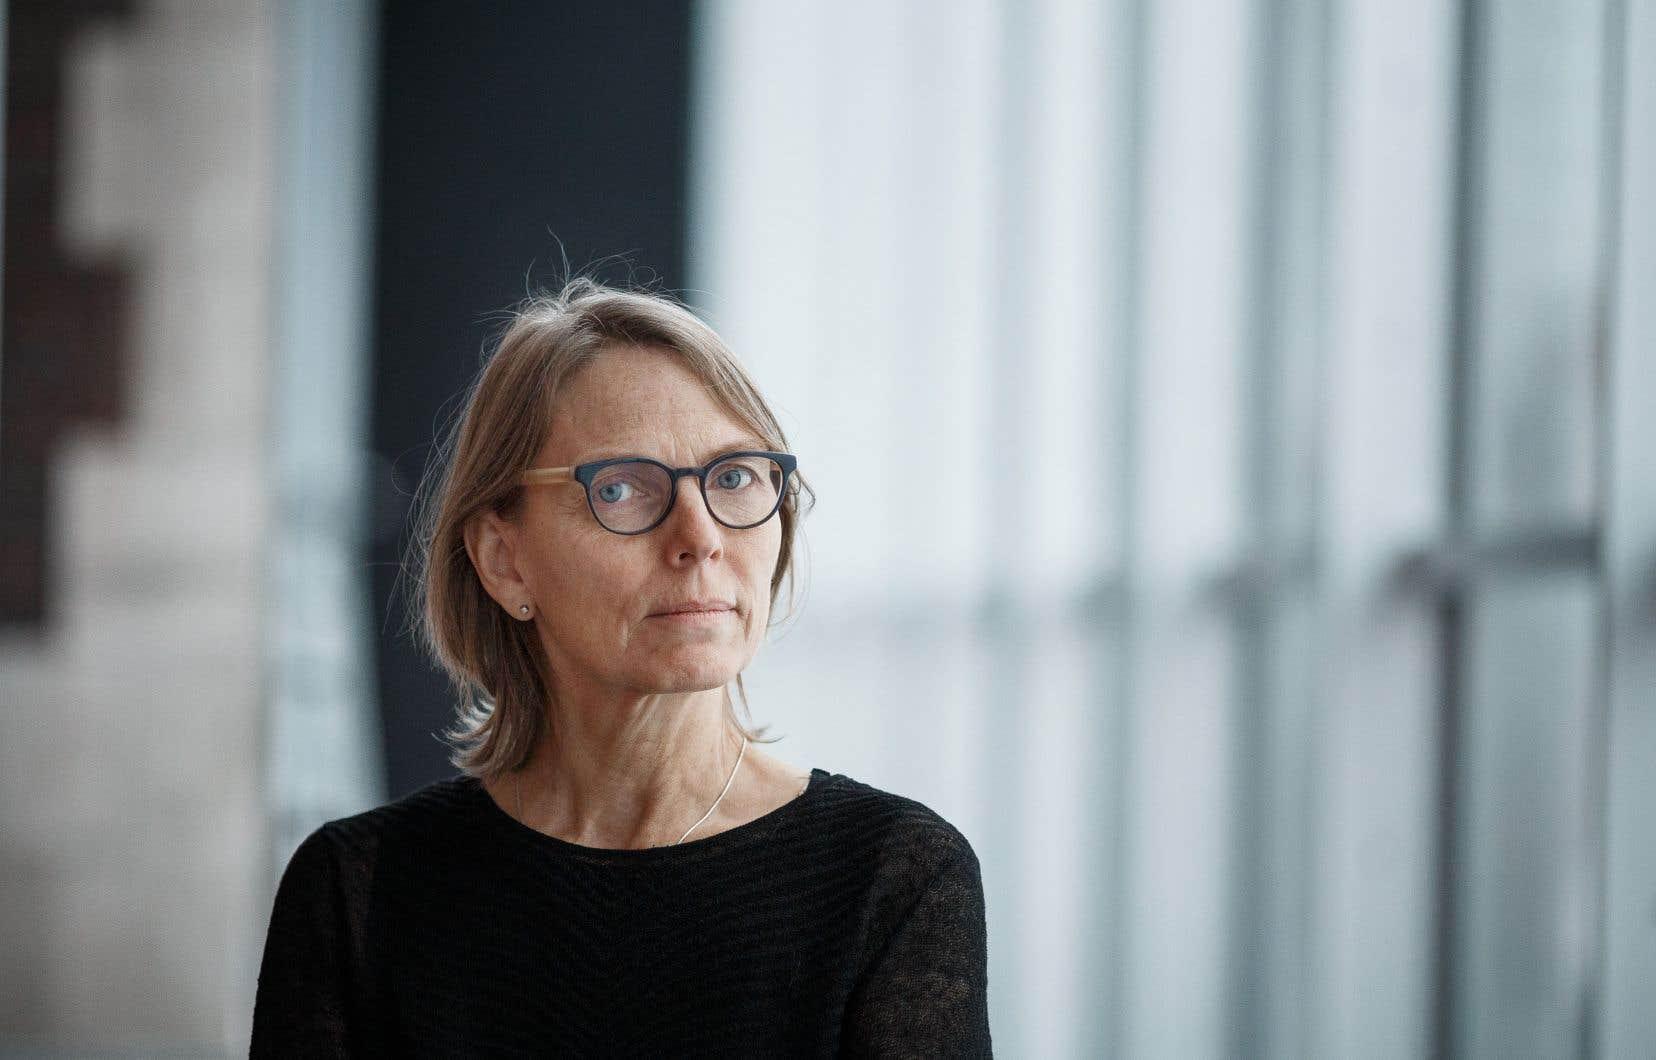 La cinéaste montréalaise d'origine norvégienne Torill Kove